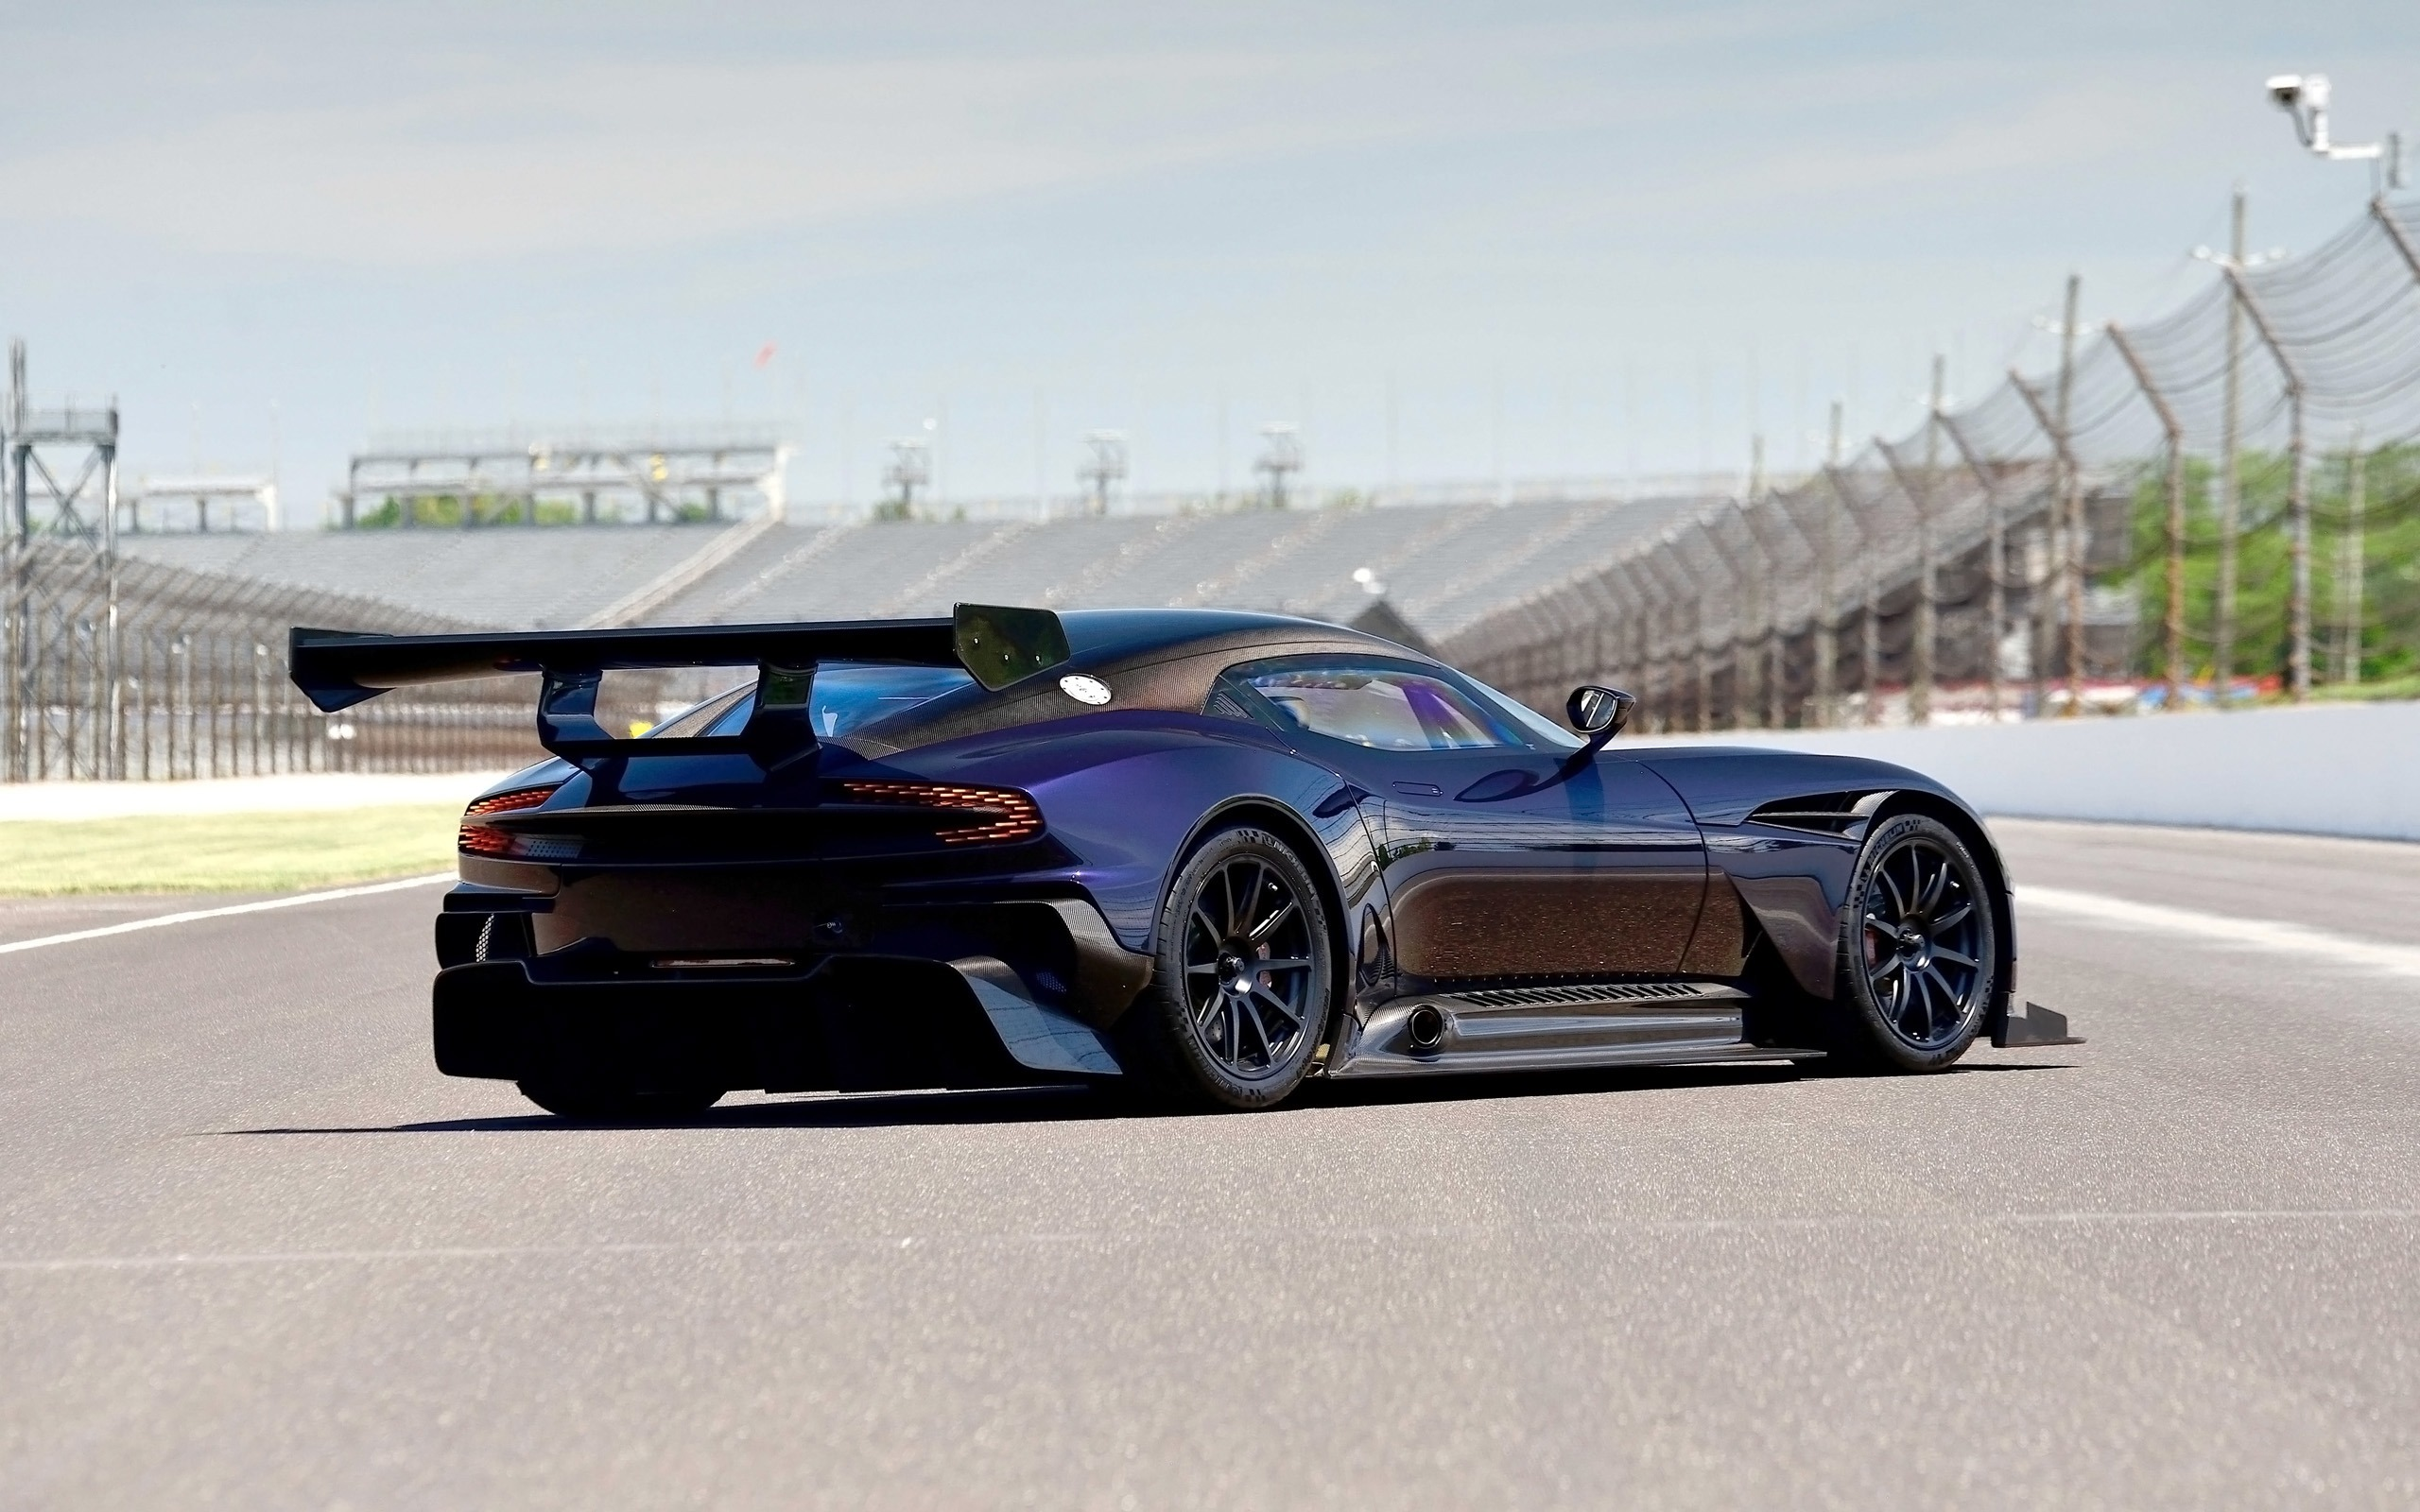 2016 Aston Martin Vulcan Supercar HD Wallpaper 02 Preview ...